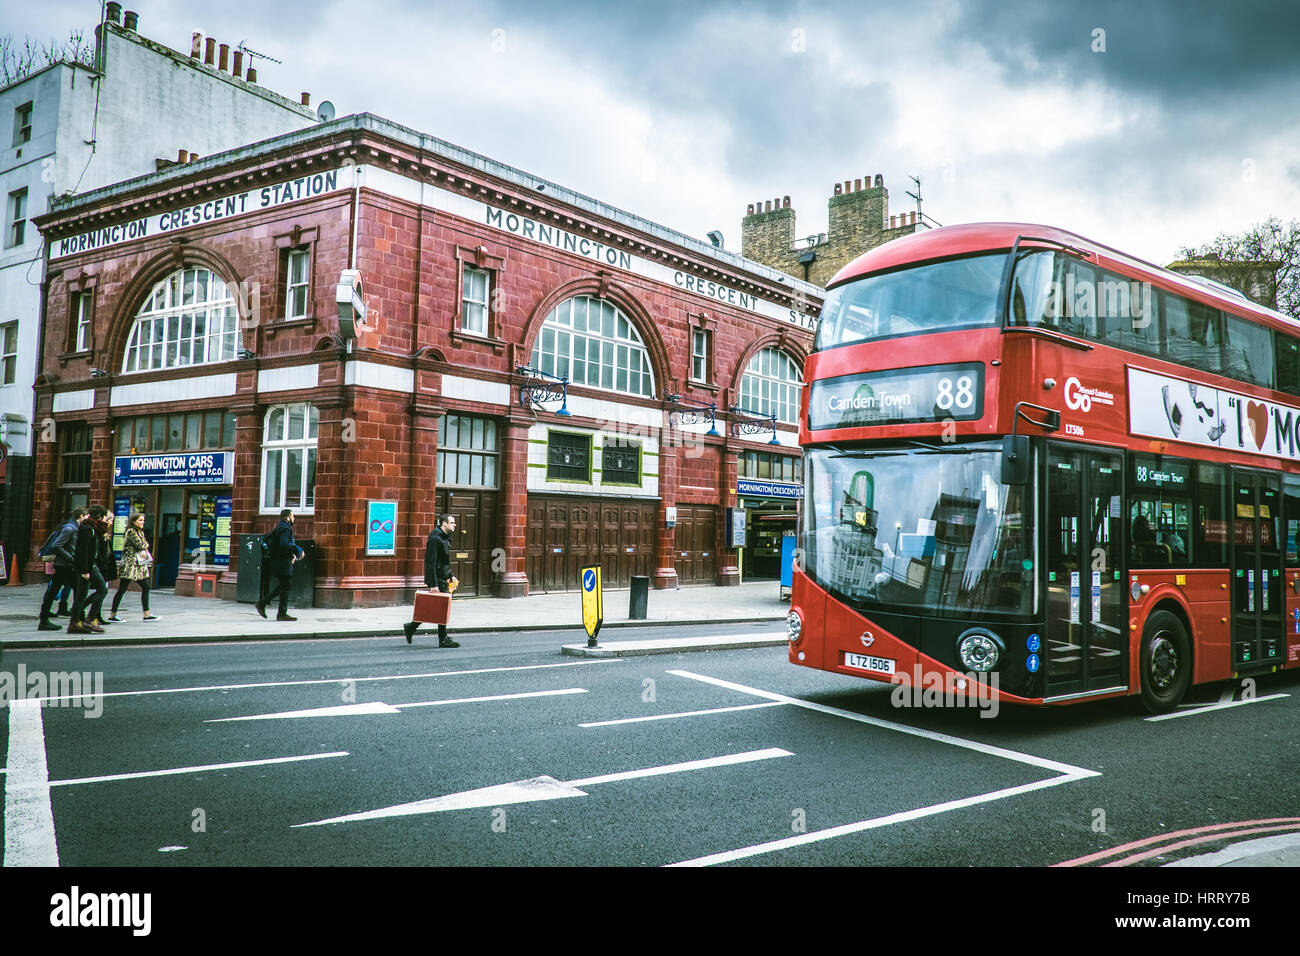 London Bus - Stock Image